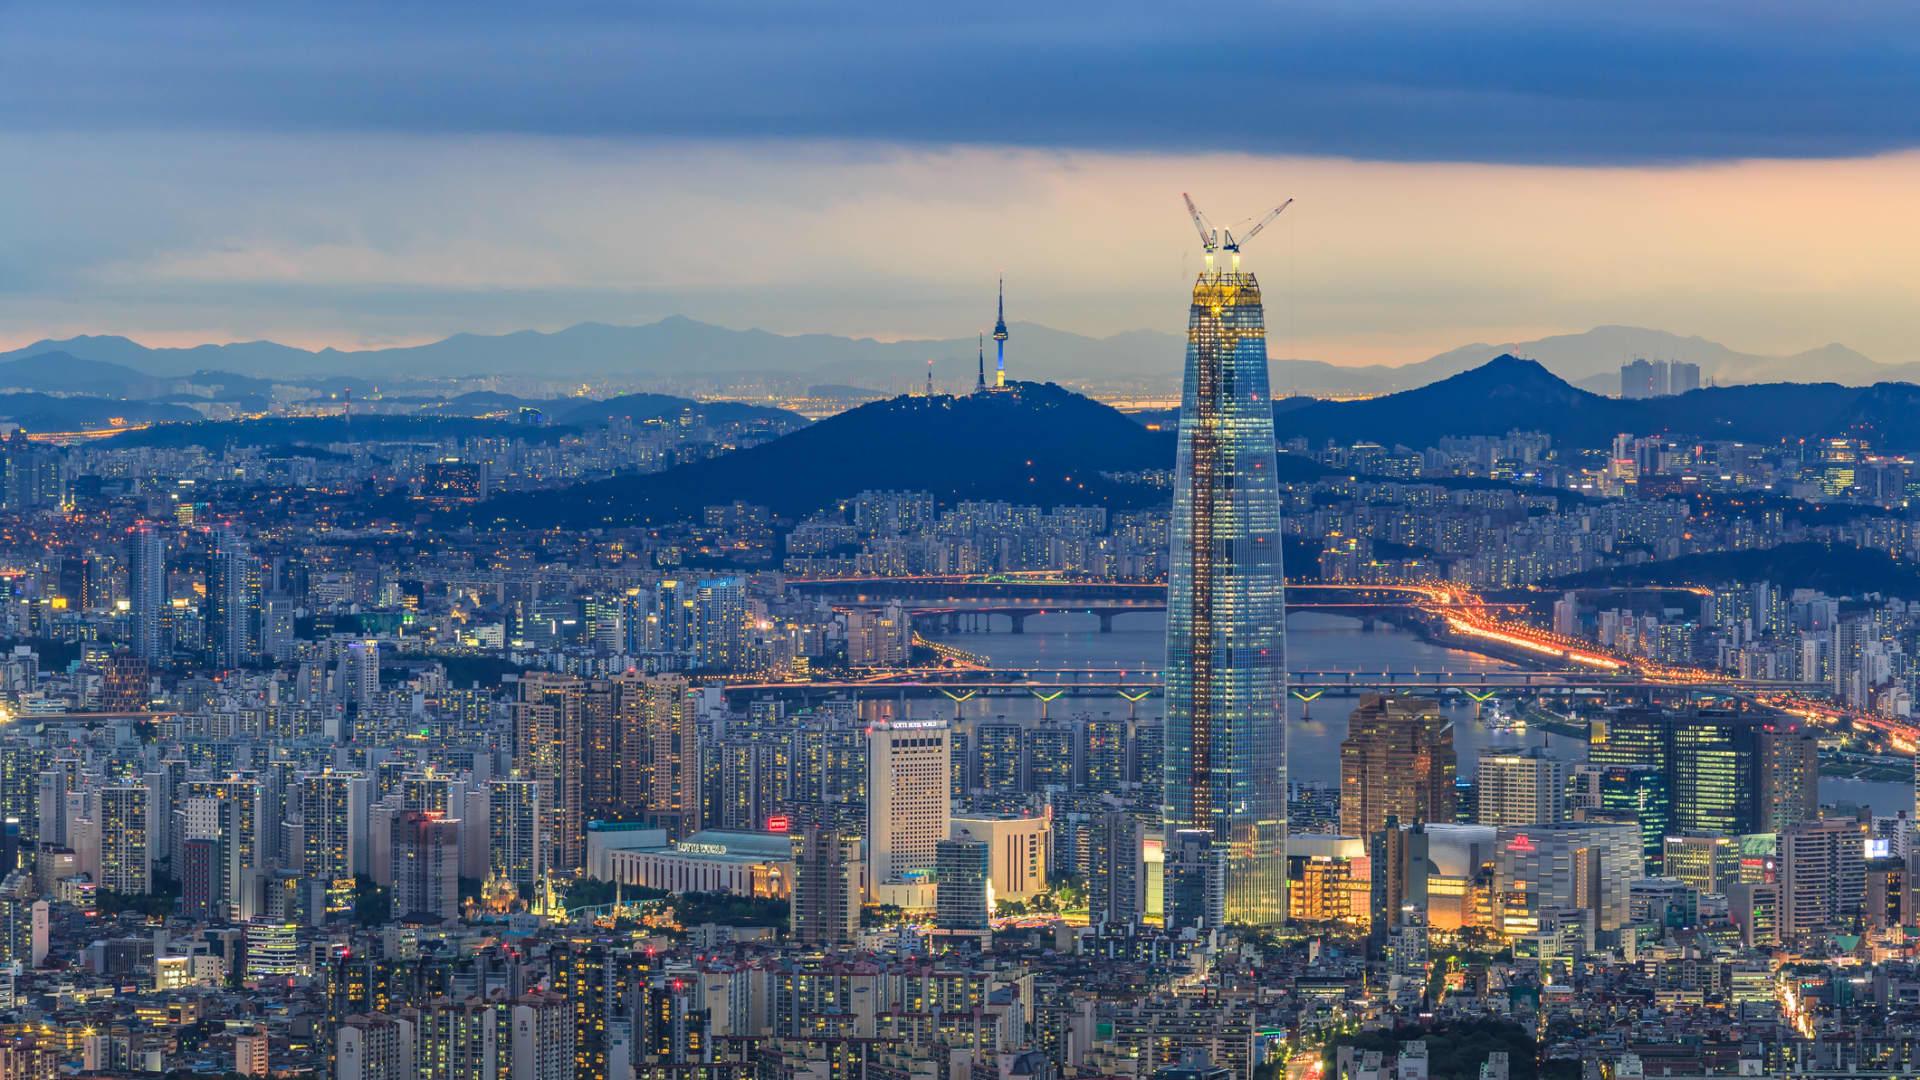 The Han River runs through the heart of South Korea's capital, Seoul.